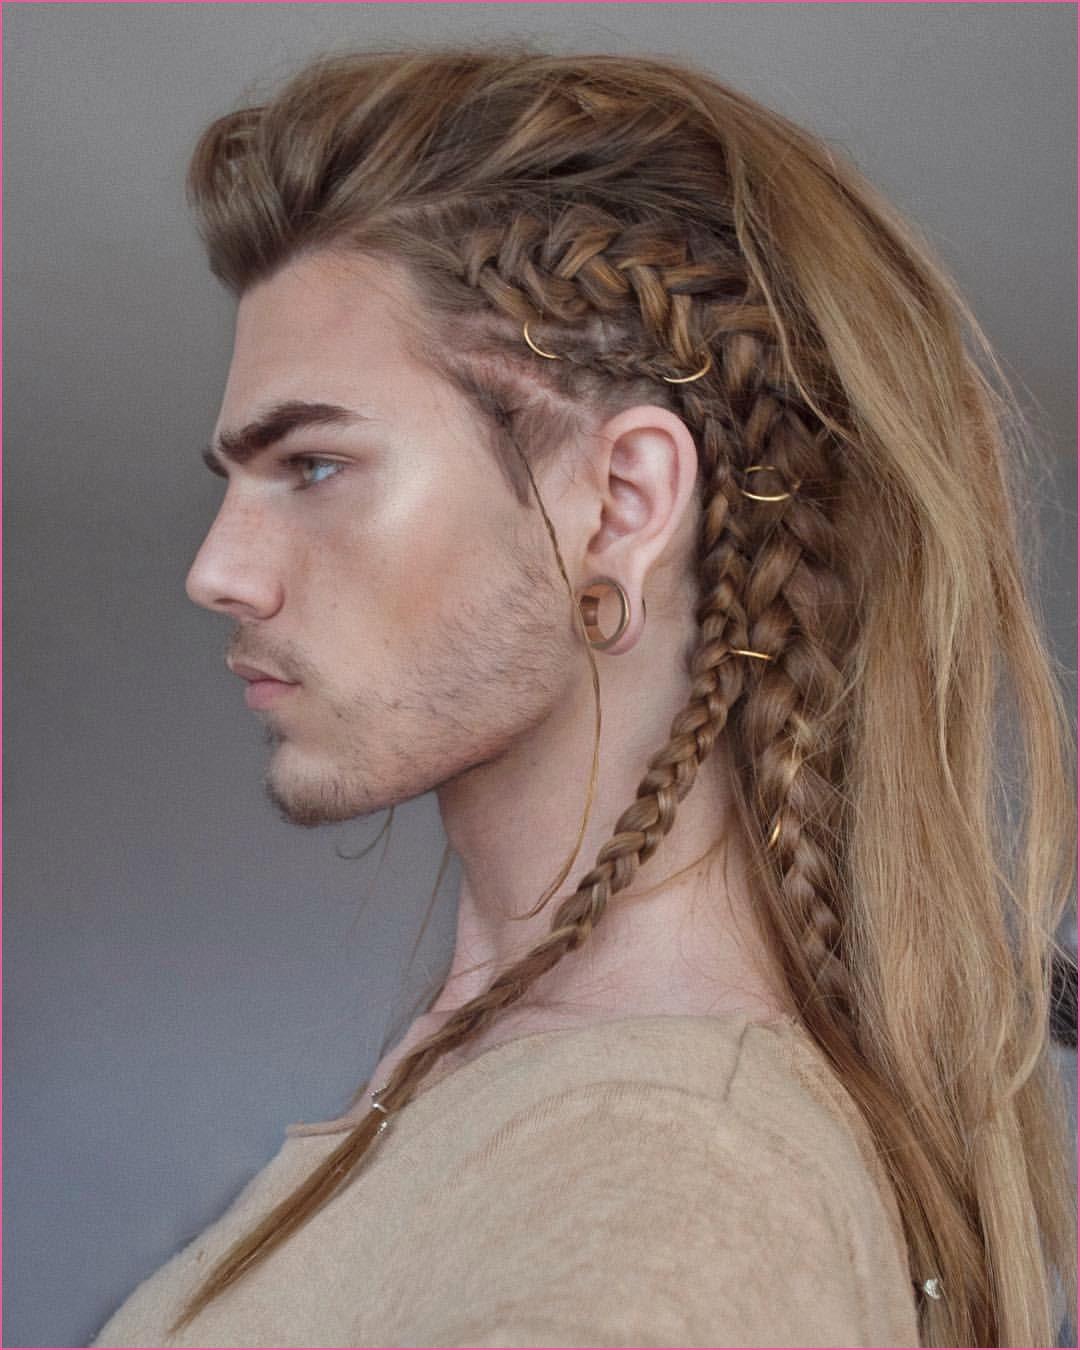 Wikinger Frisuren Frauen Herrenfrisuren Haarschnitt Wikinger Frisuren